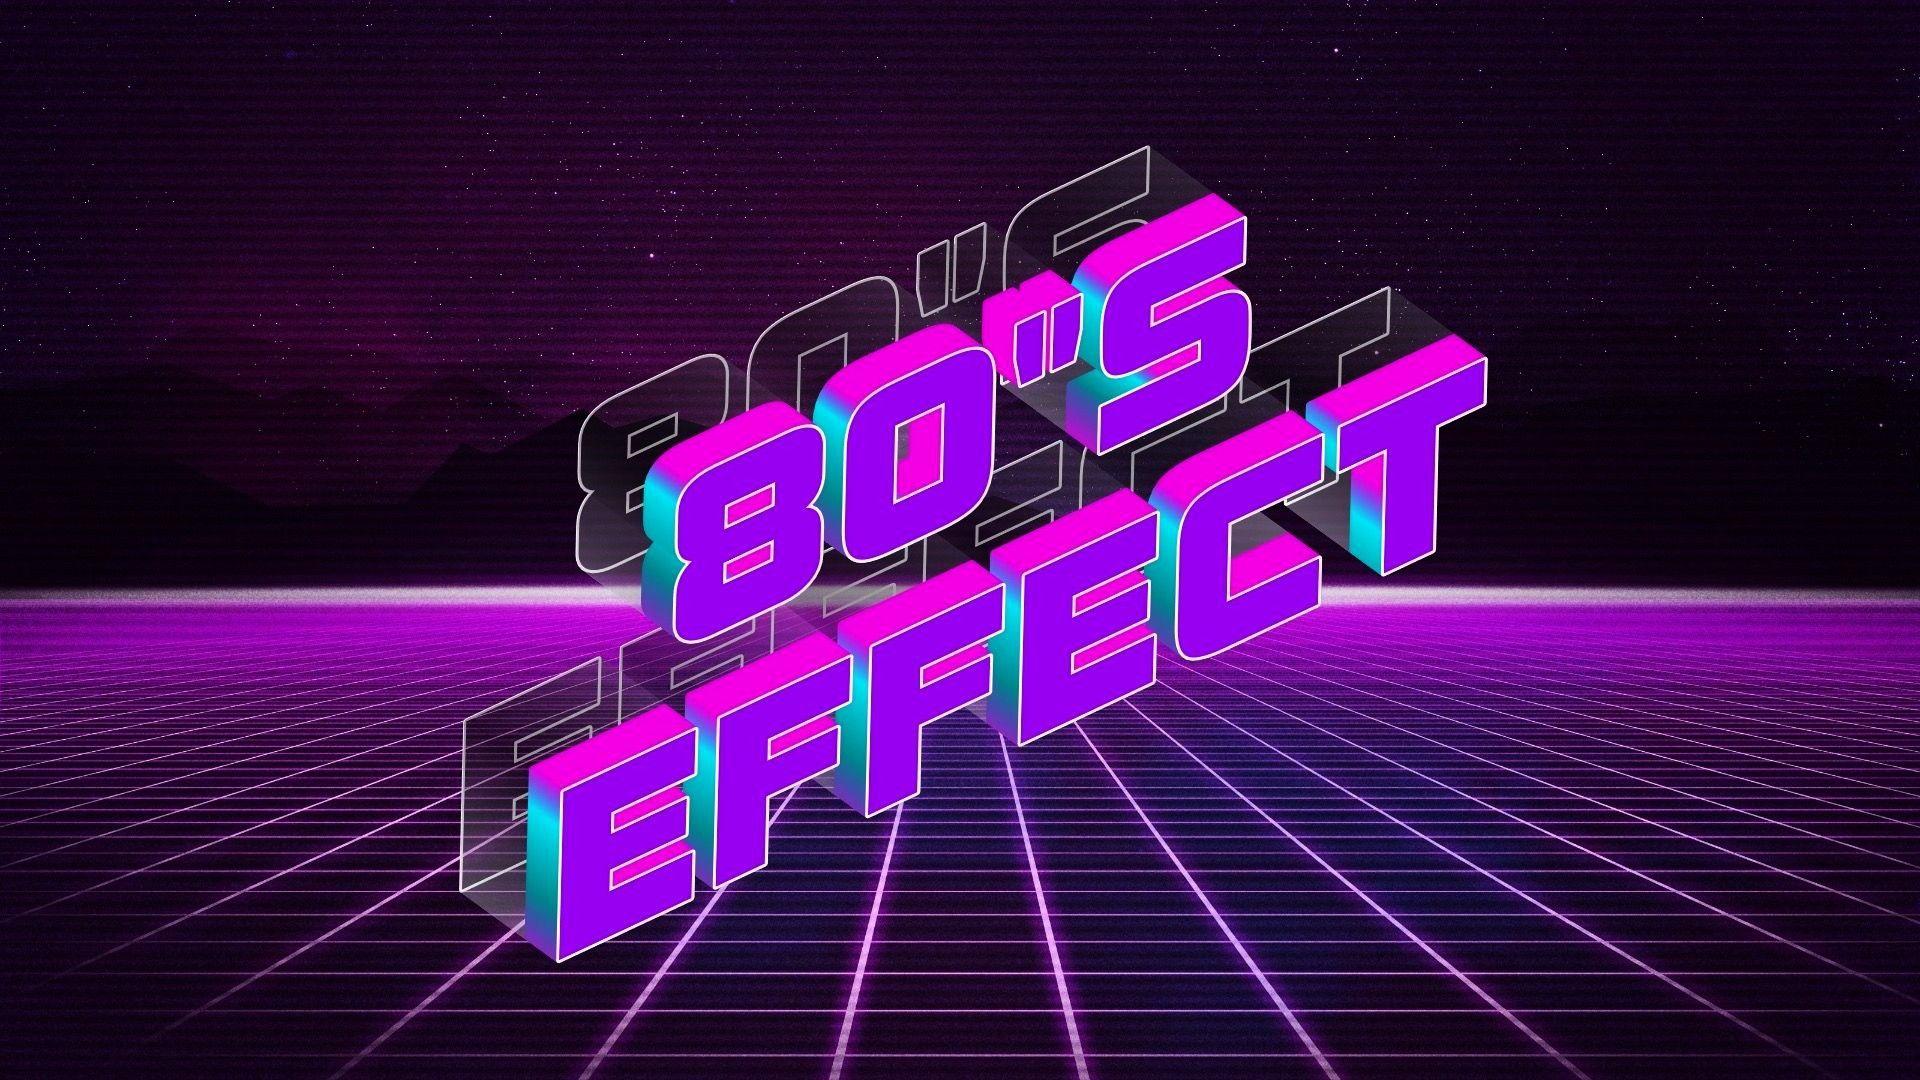 Fonttextupcom Logodesign Generator Effect Design Retro Logo Make Cool Font 80s On 3d80s Logo Effect Make On Cool Logo In 2020 Cool Logo Cool Stuff Fonts